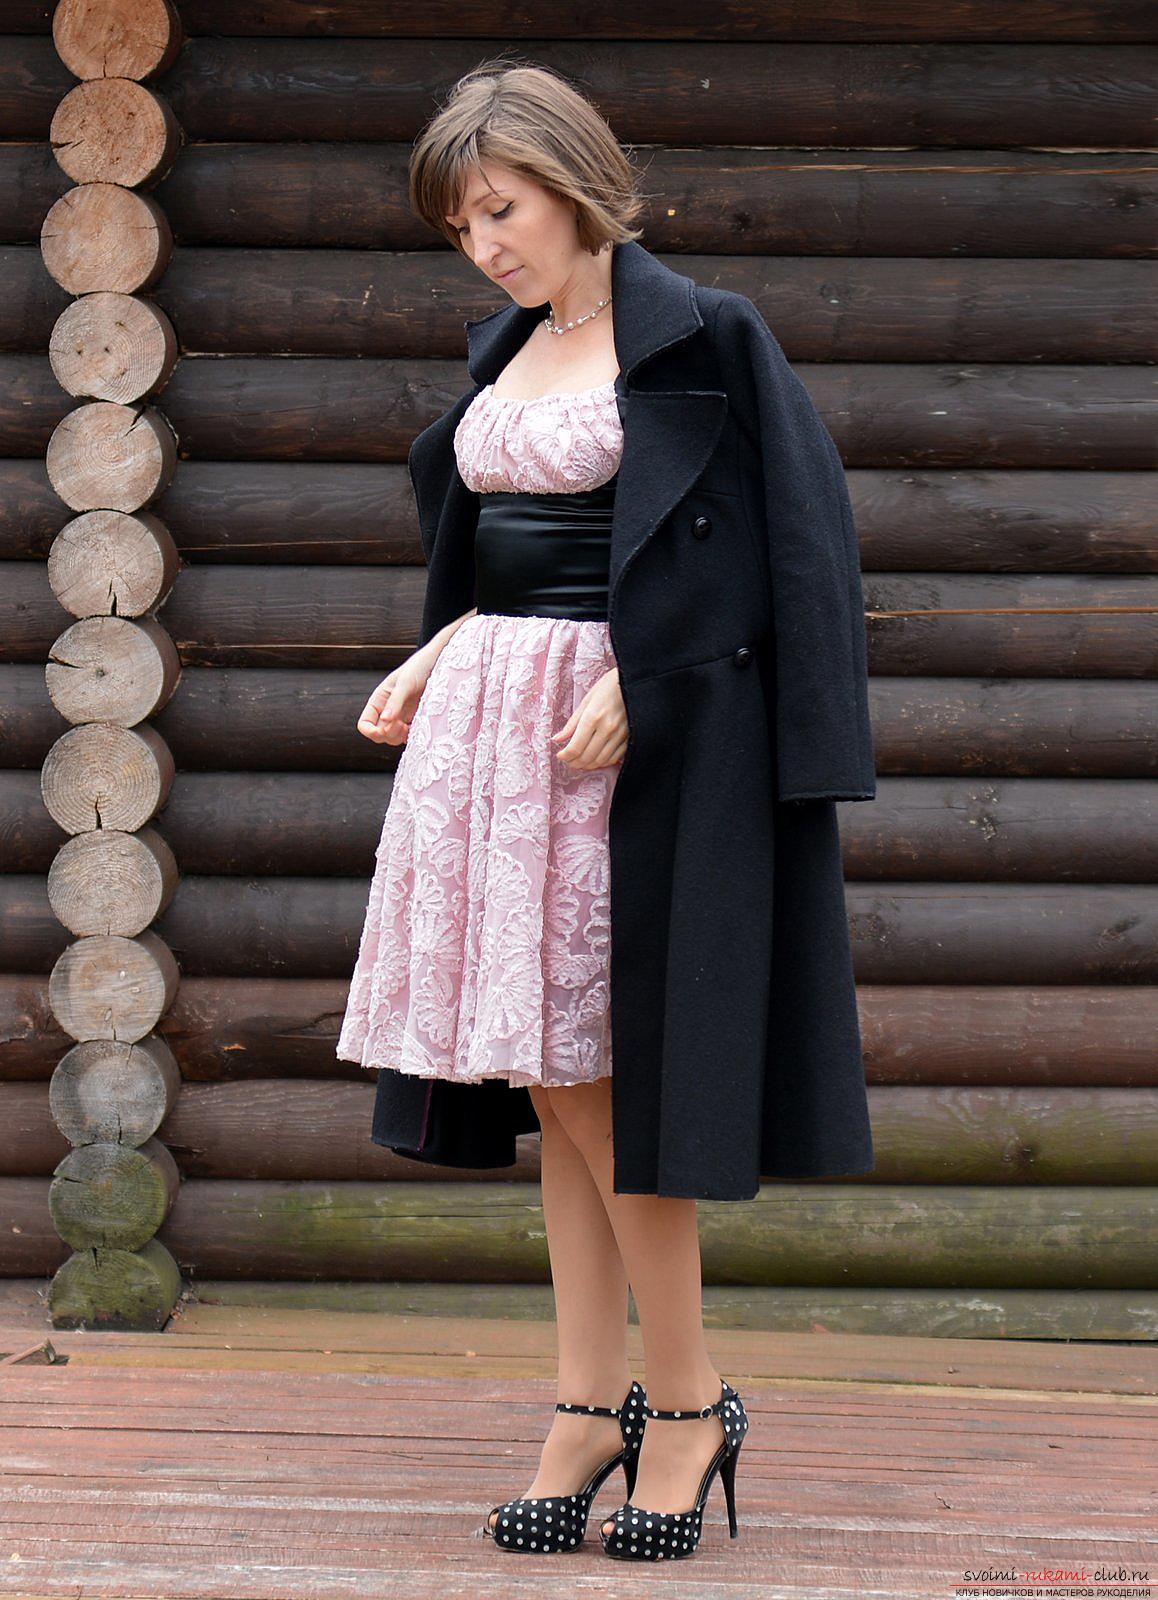 Шитье платья мастер класс фото #12